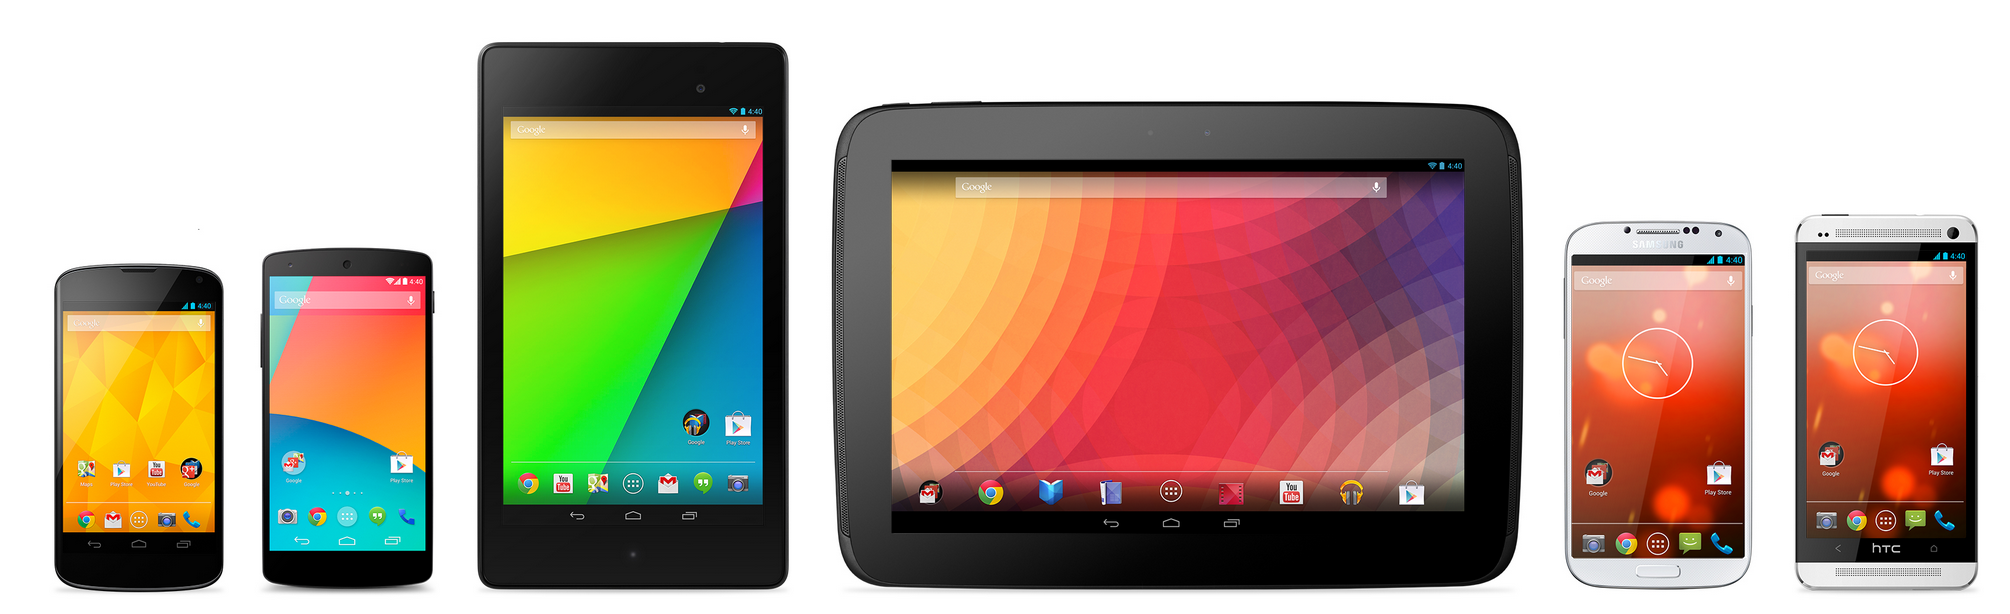 Android-kitkat-updates